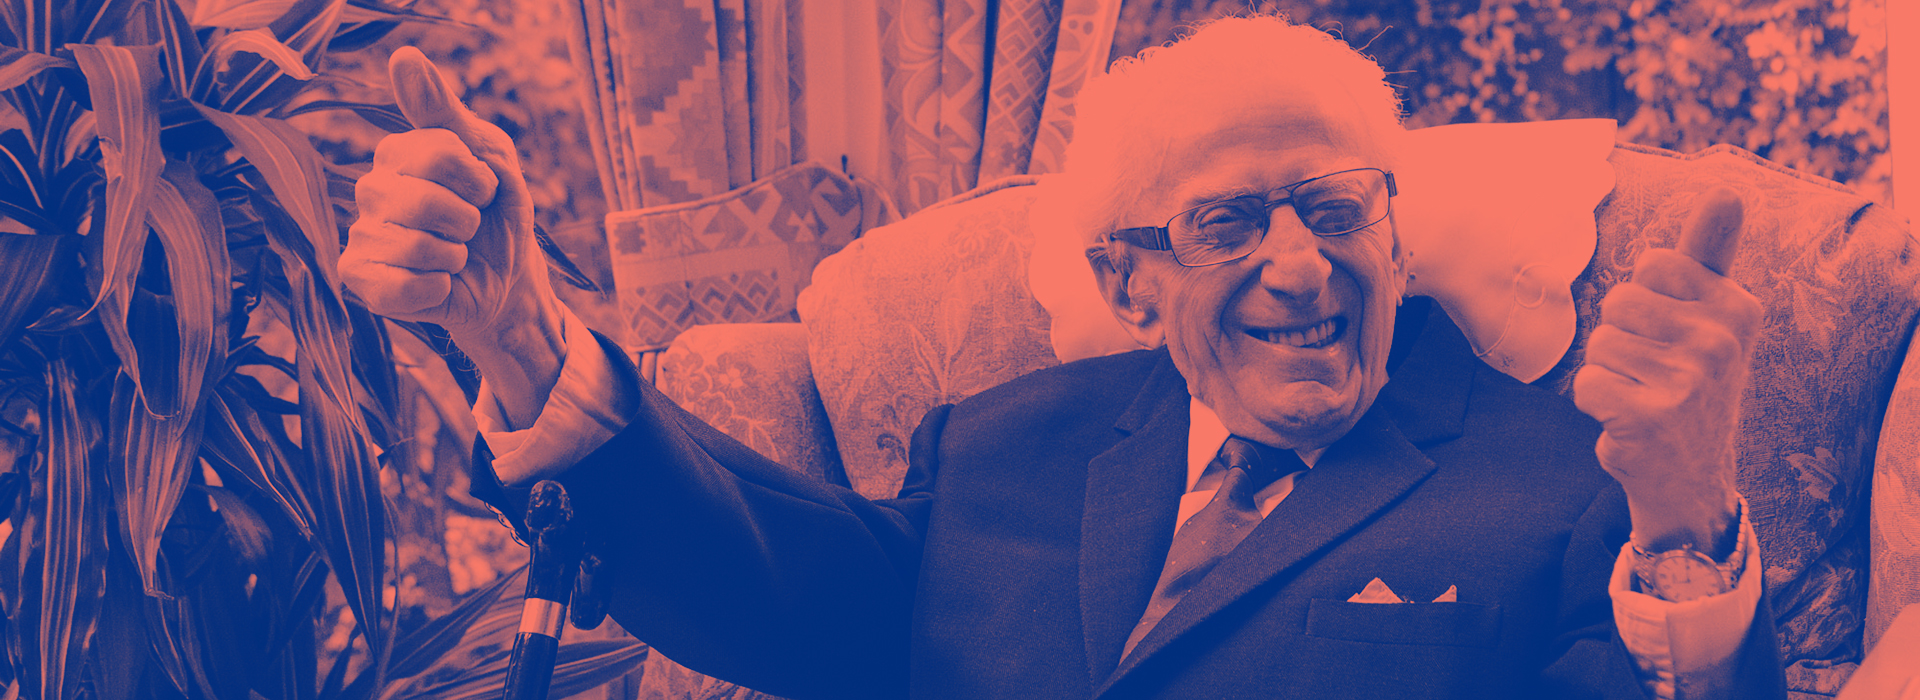 JewishChoice ambition